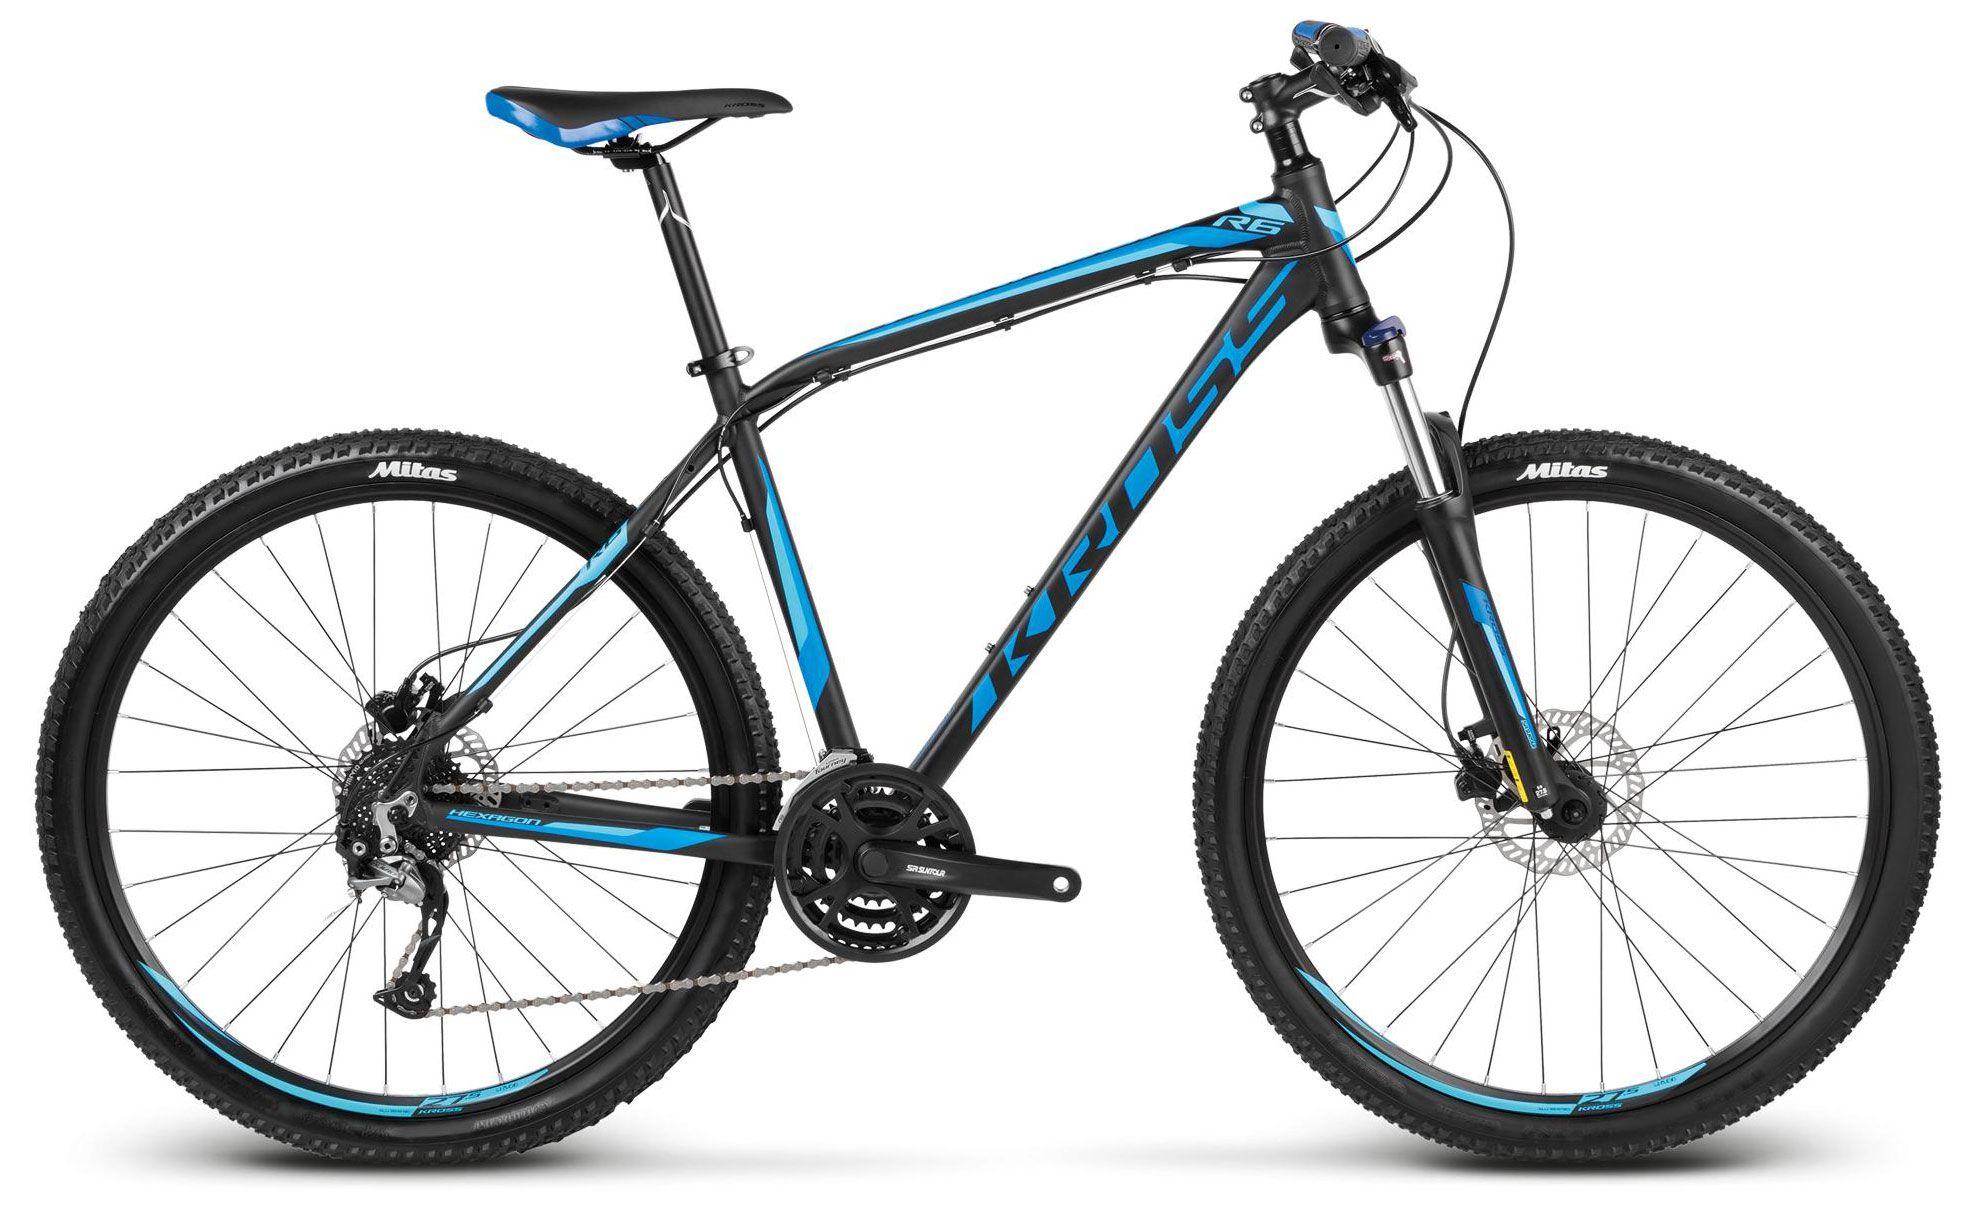 Велосипед KROSS Hexagon R6 2017 велосипед kross hexagon mini 2015